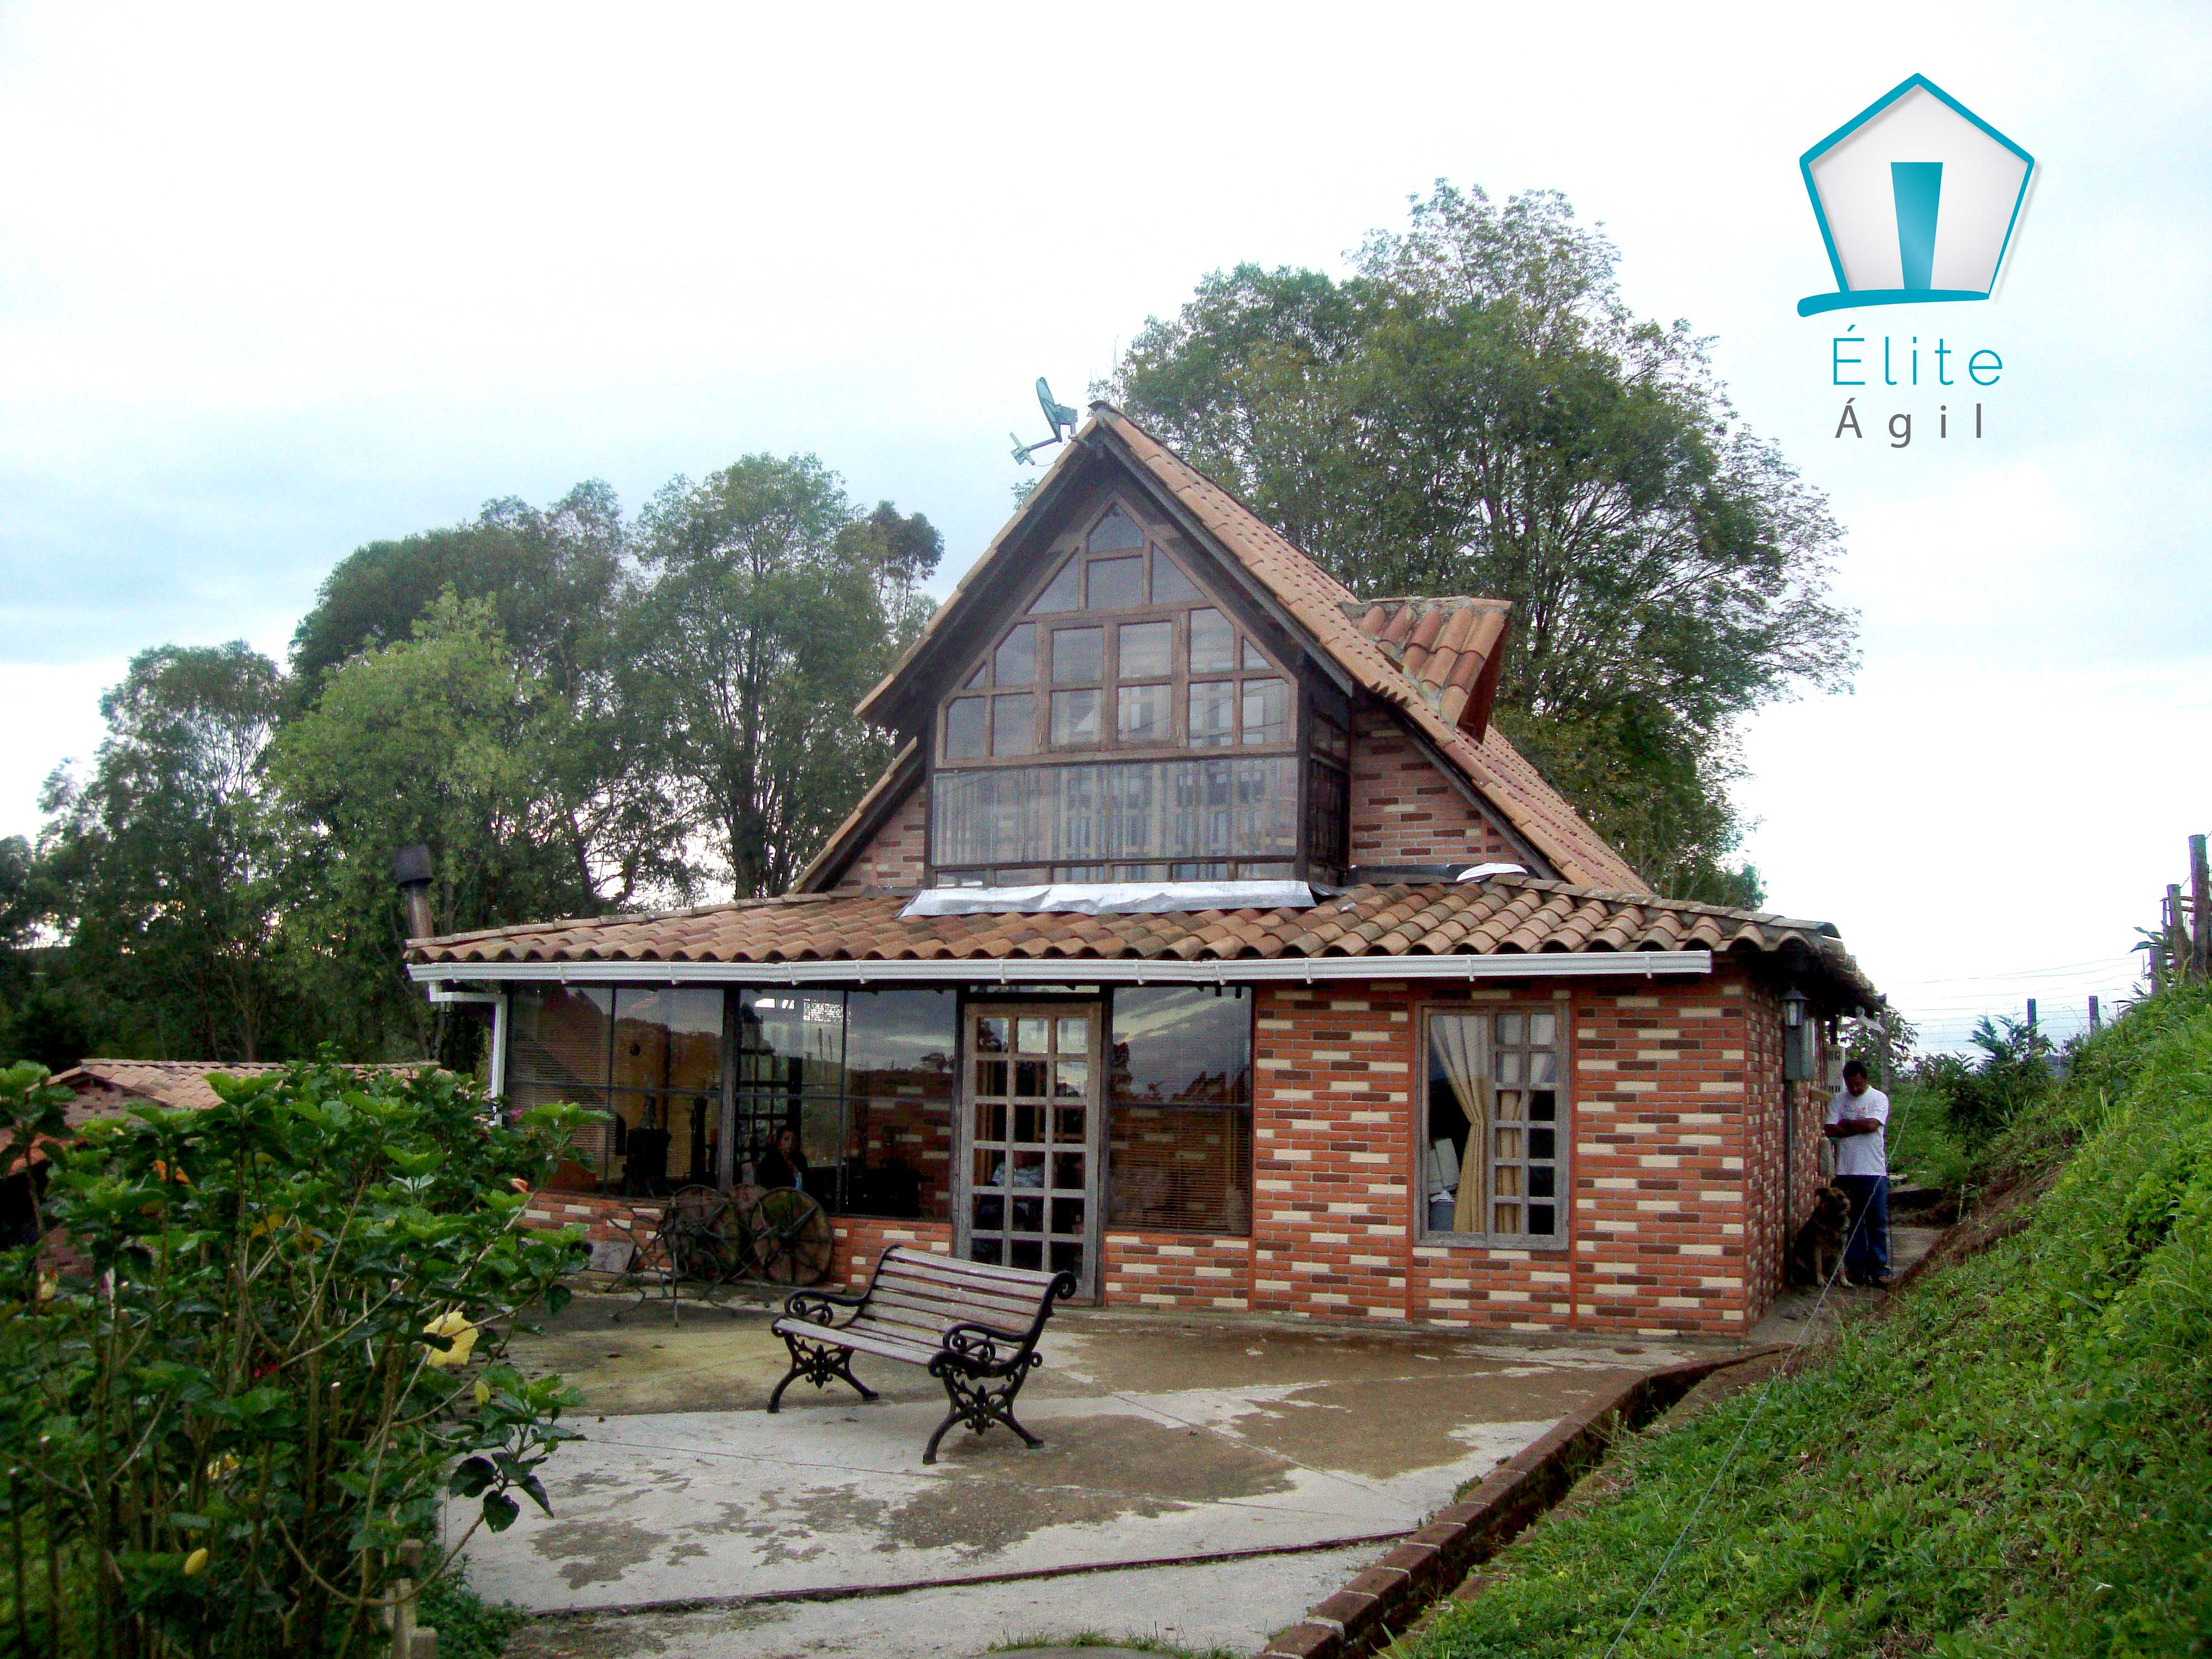 Construcci n moderna con casas prefabricadas econ micas for Construccion de albercas economicas